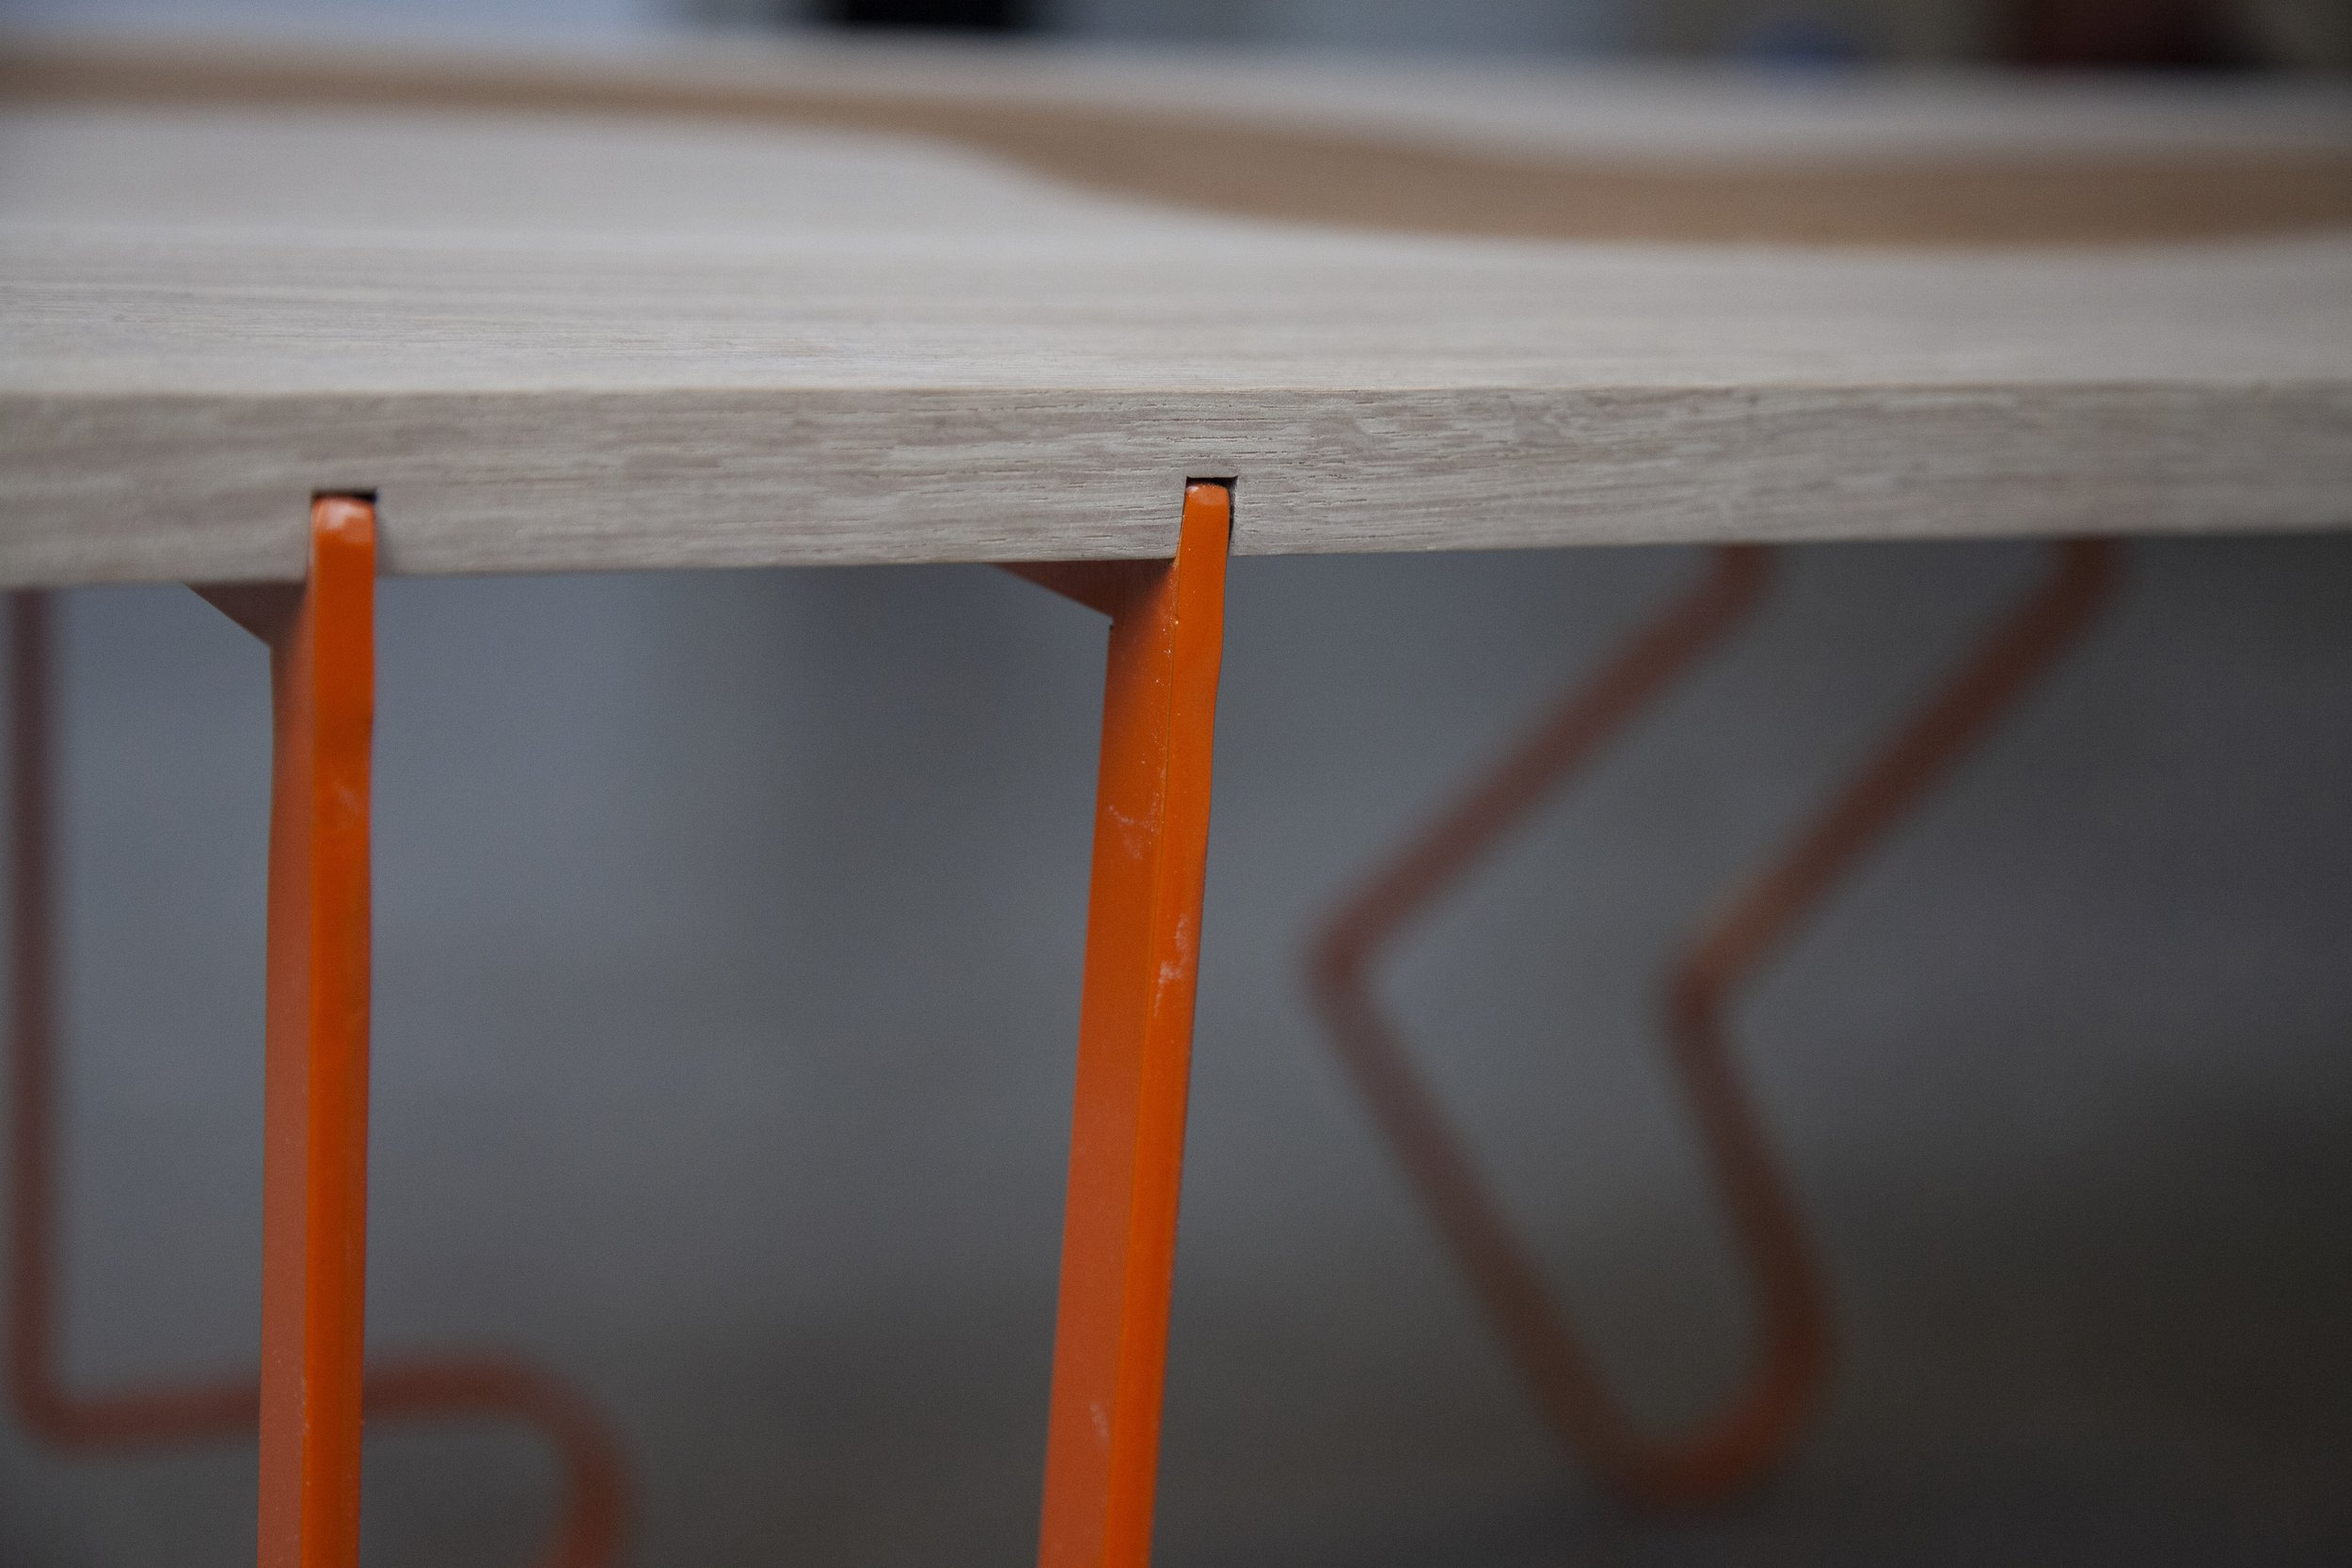 Majenta_Strongheart_Finish Line Detail 2